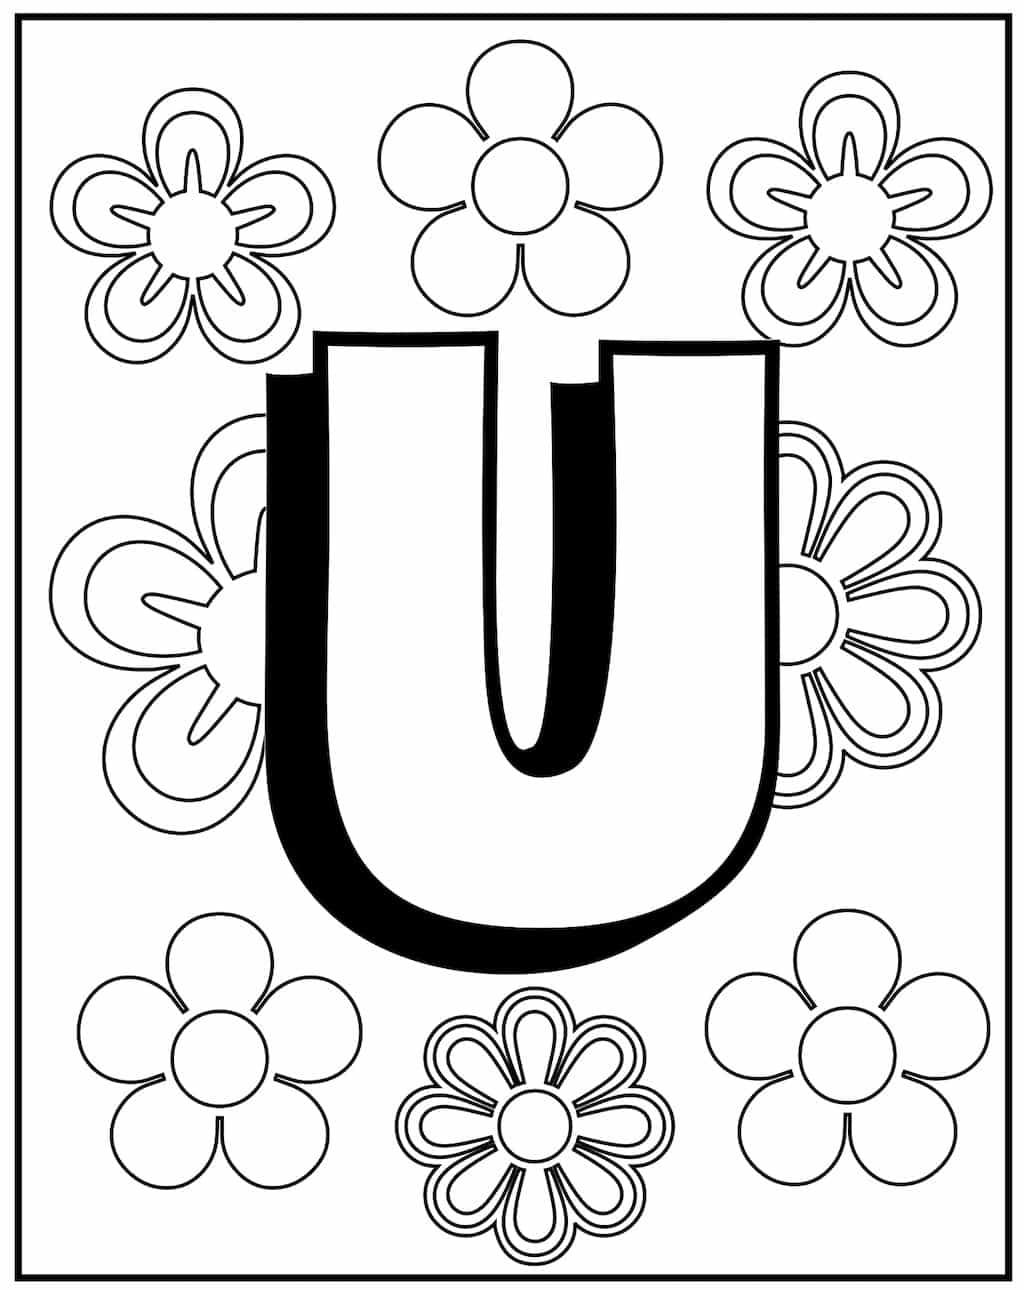 kleurplaat letter u 2 topkleurplaat nl